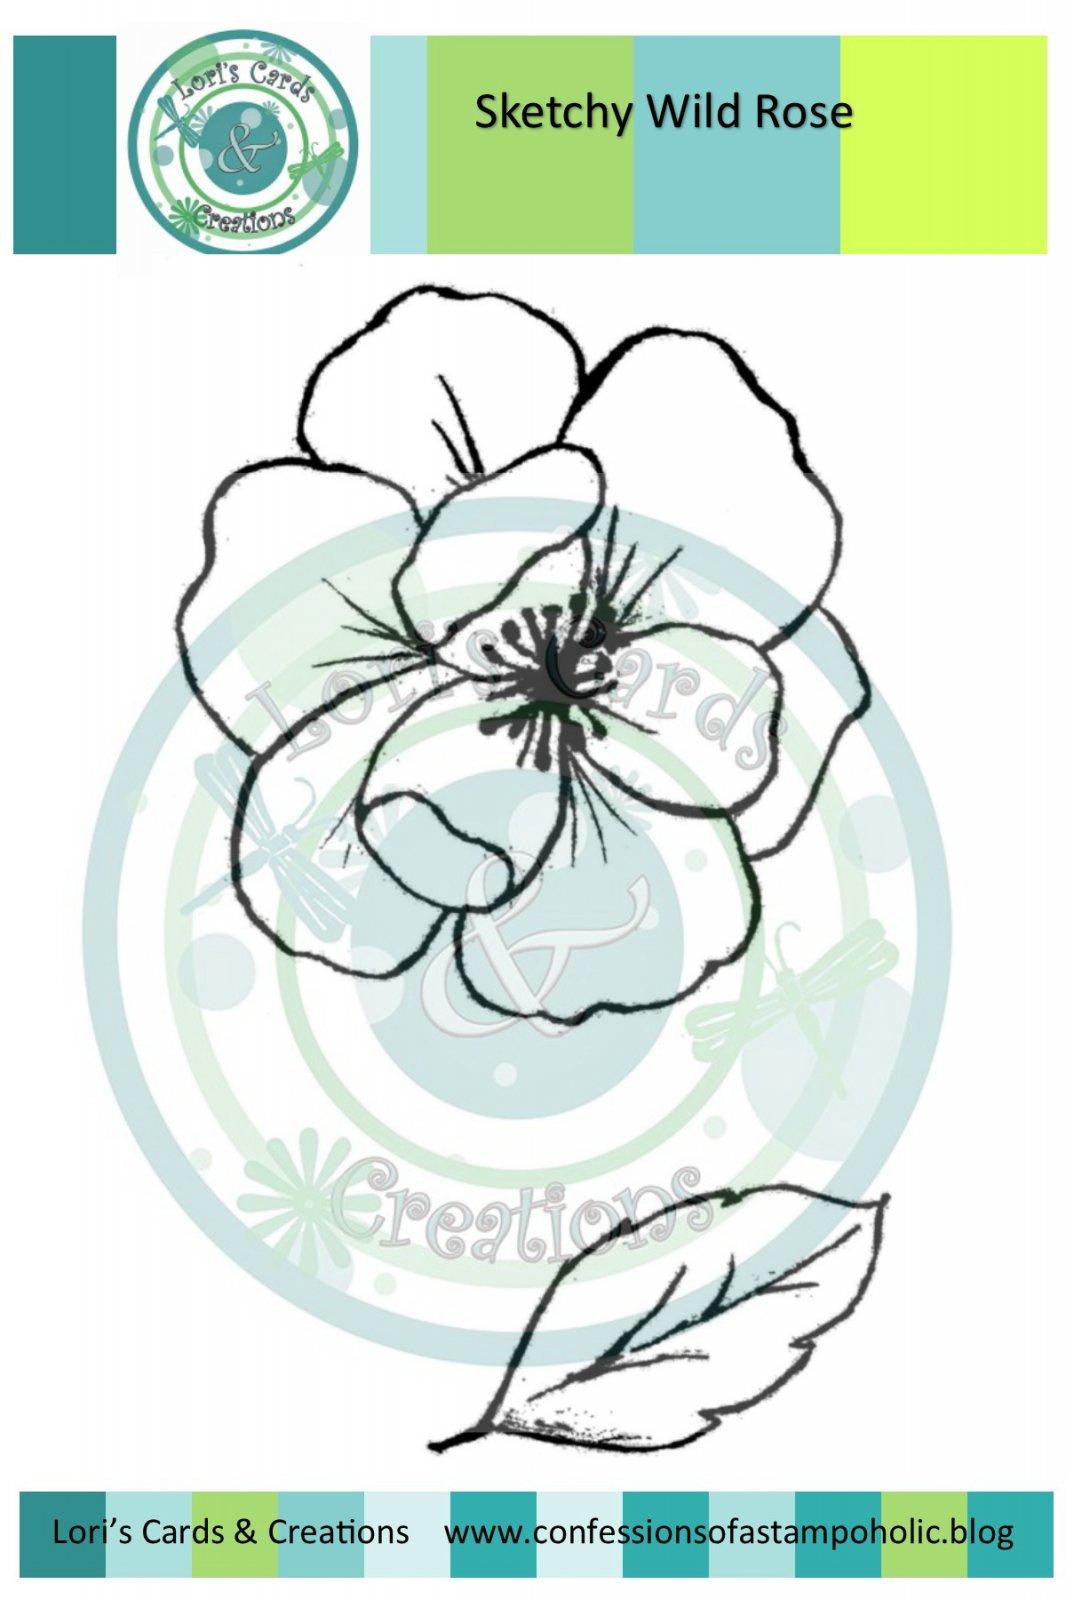 Sketchy Wild Rose